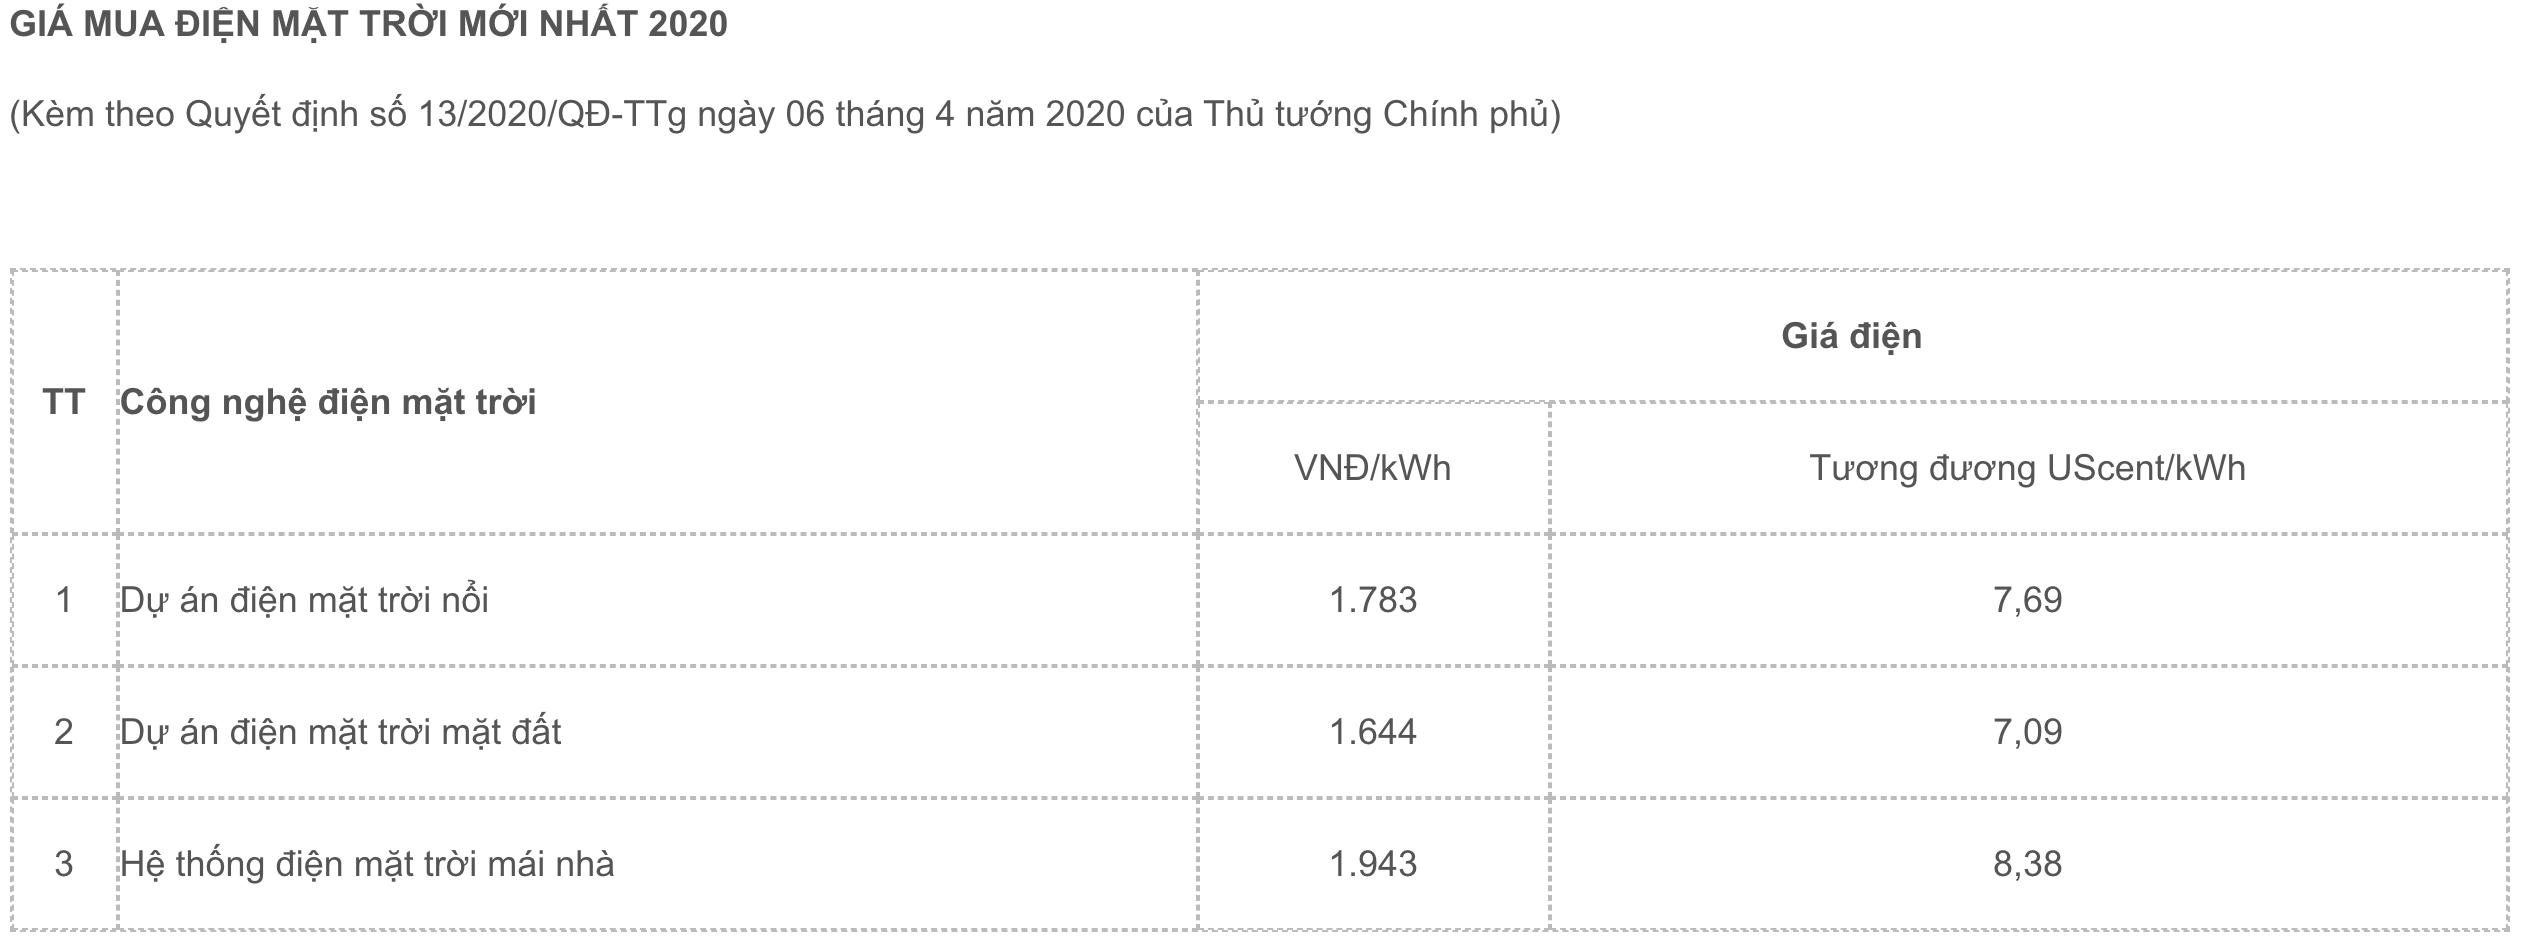 gia-mua-dien-nang-luong-mat-troi-moi-nhat-2020